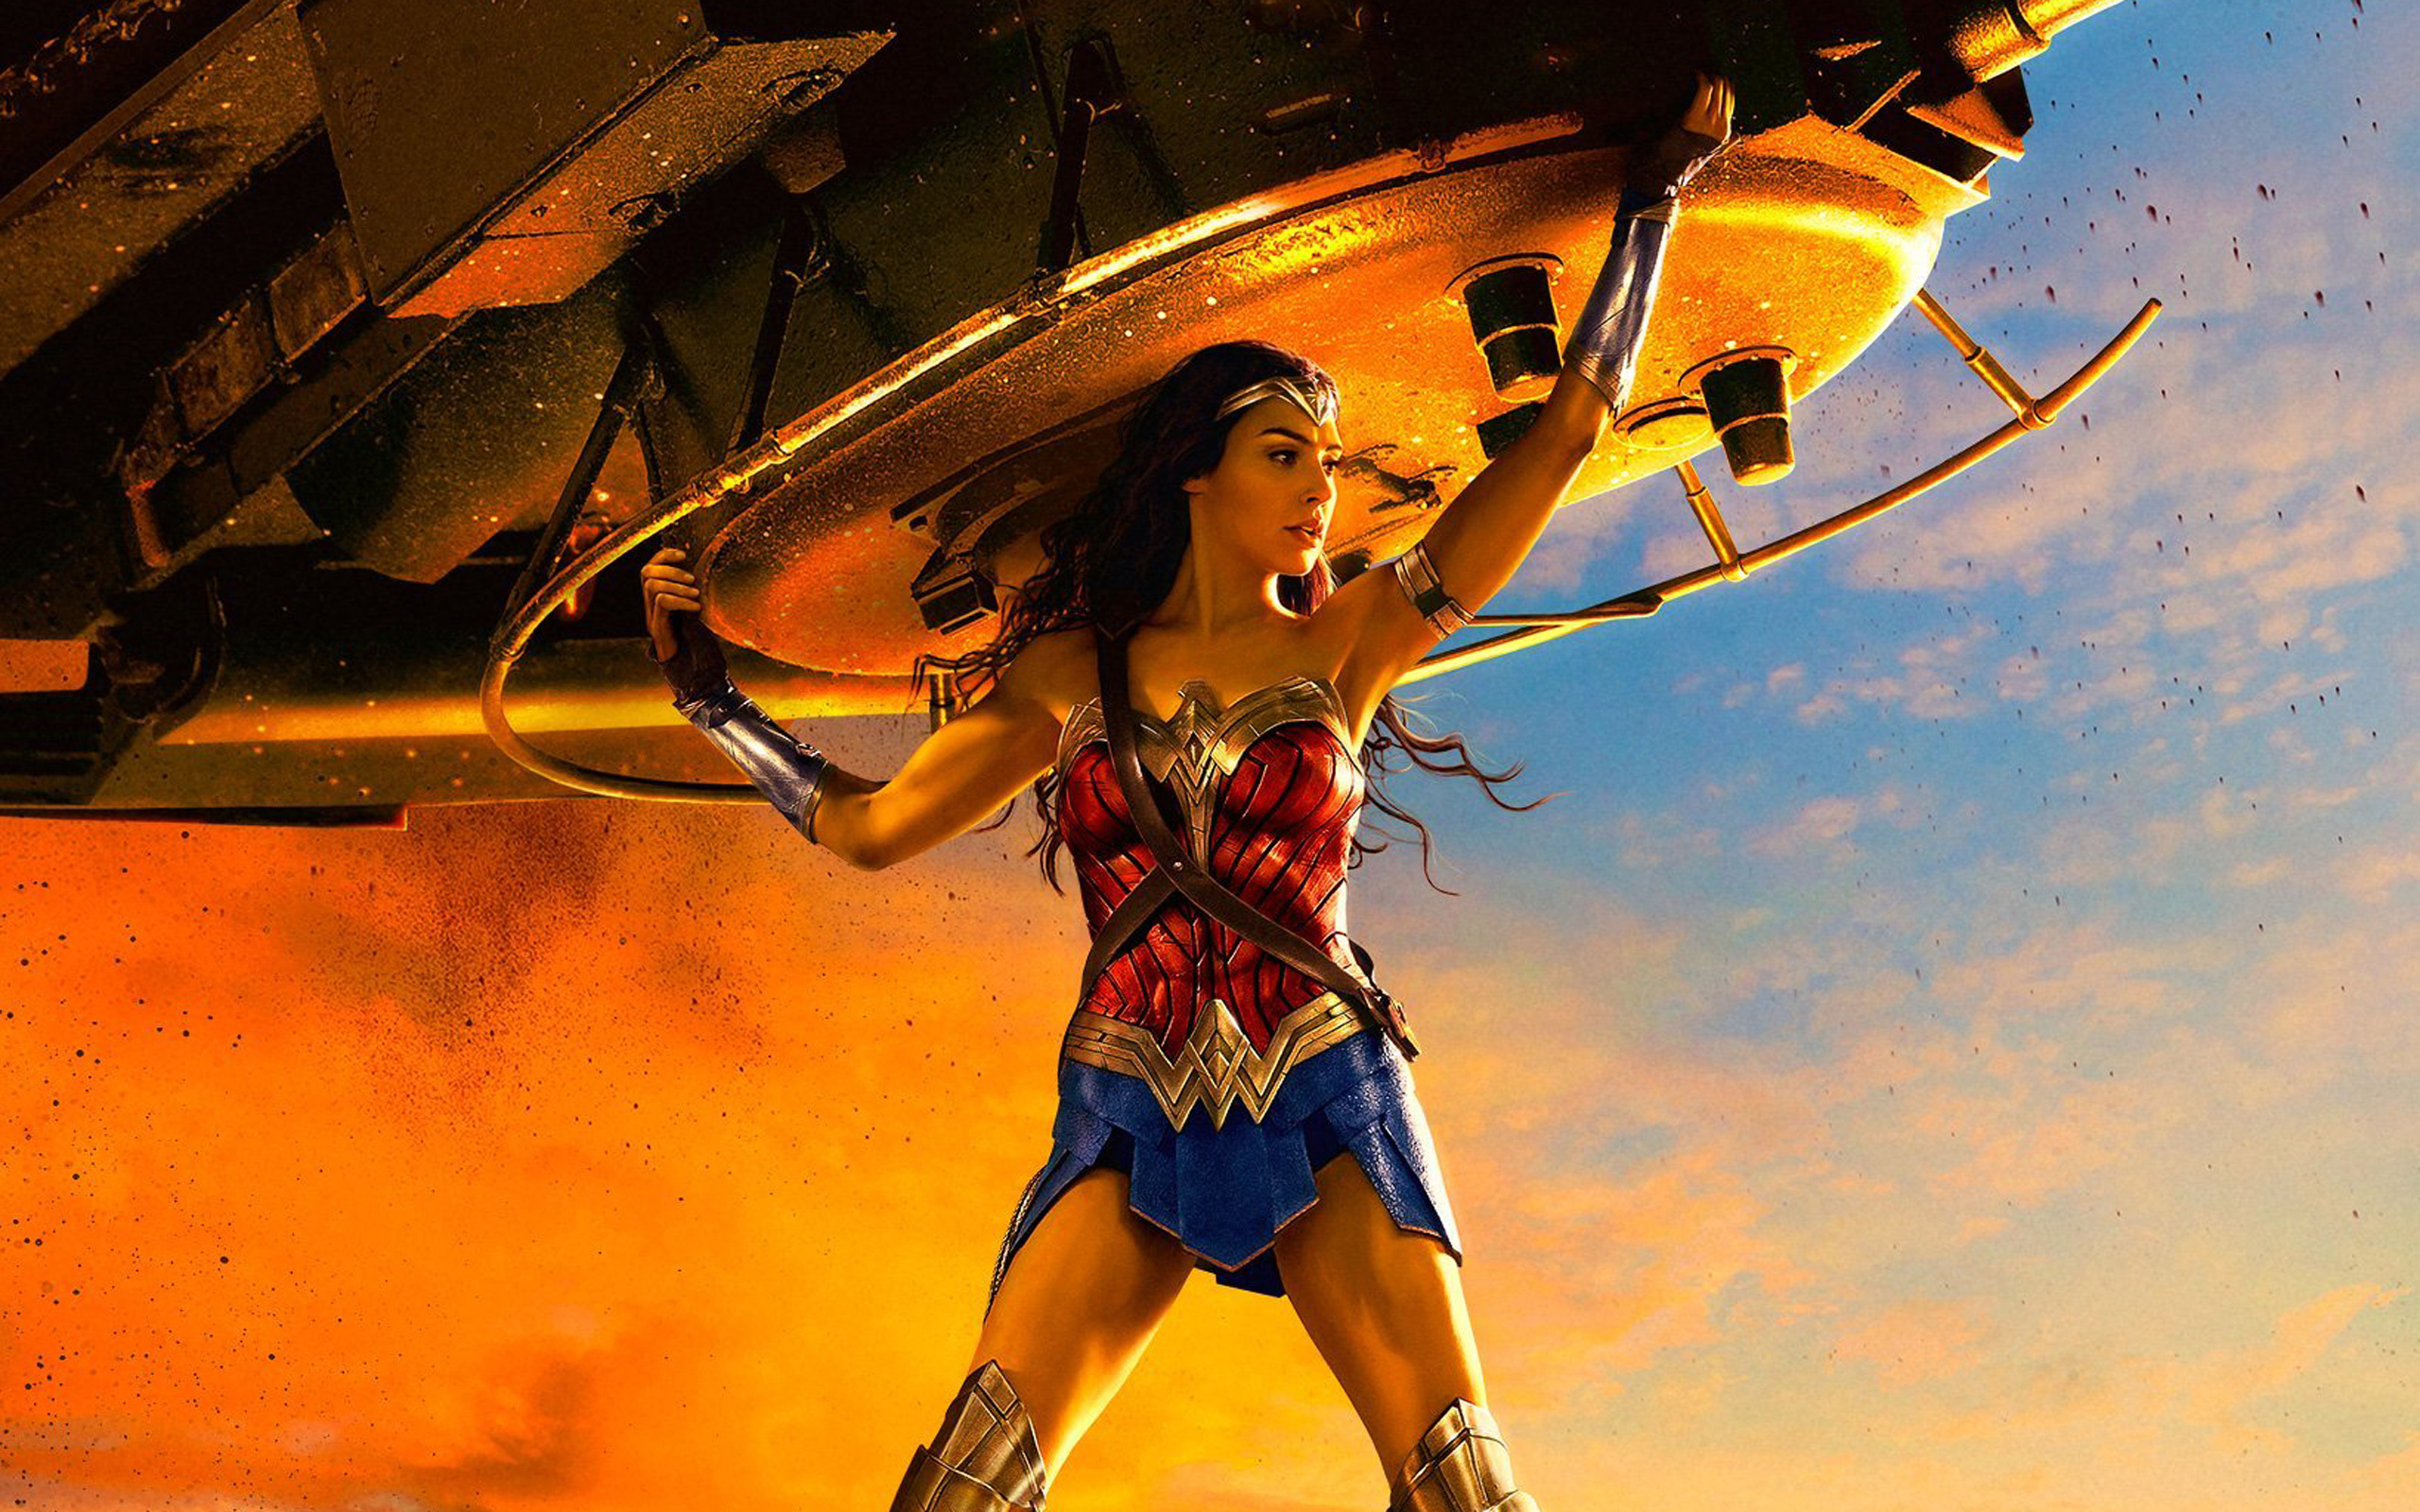 wonder woman lifting tank, hd movies, 4k wallpapers, images